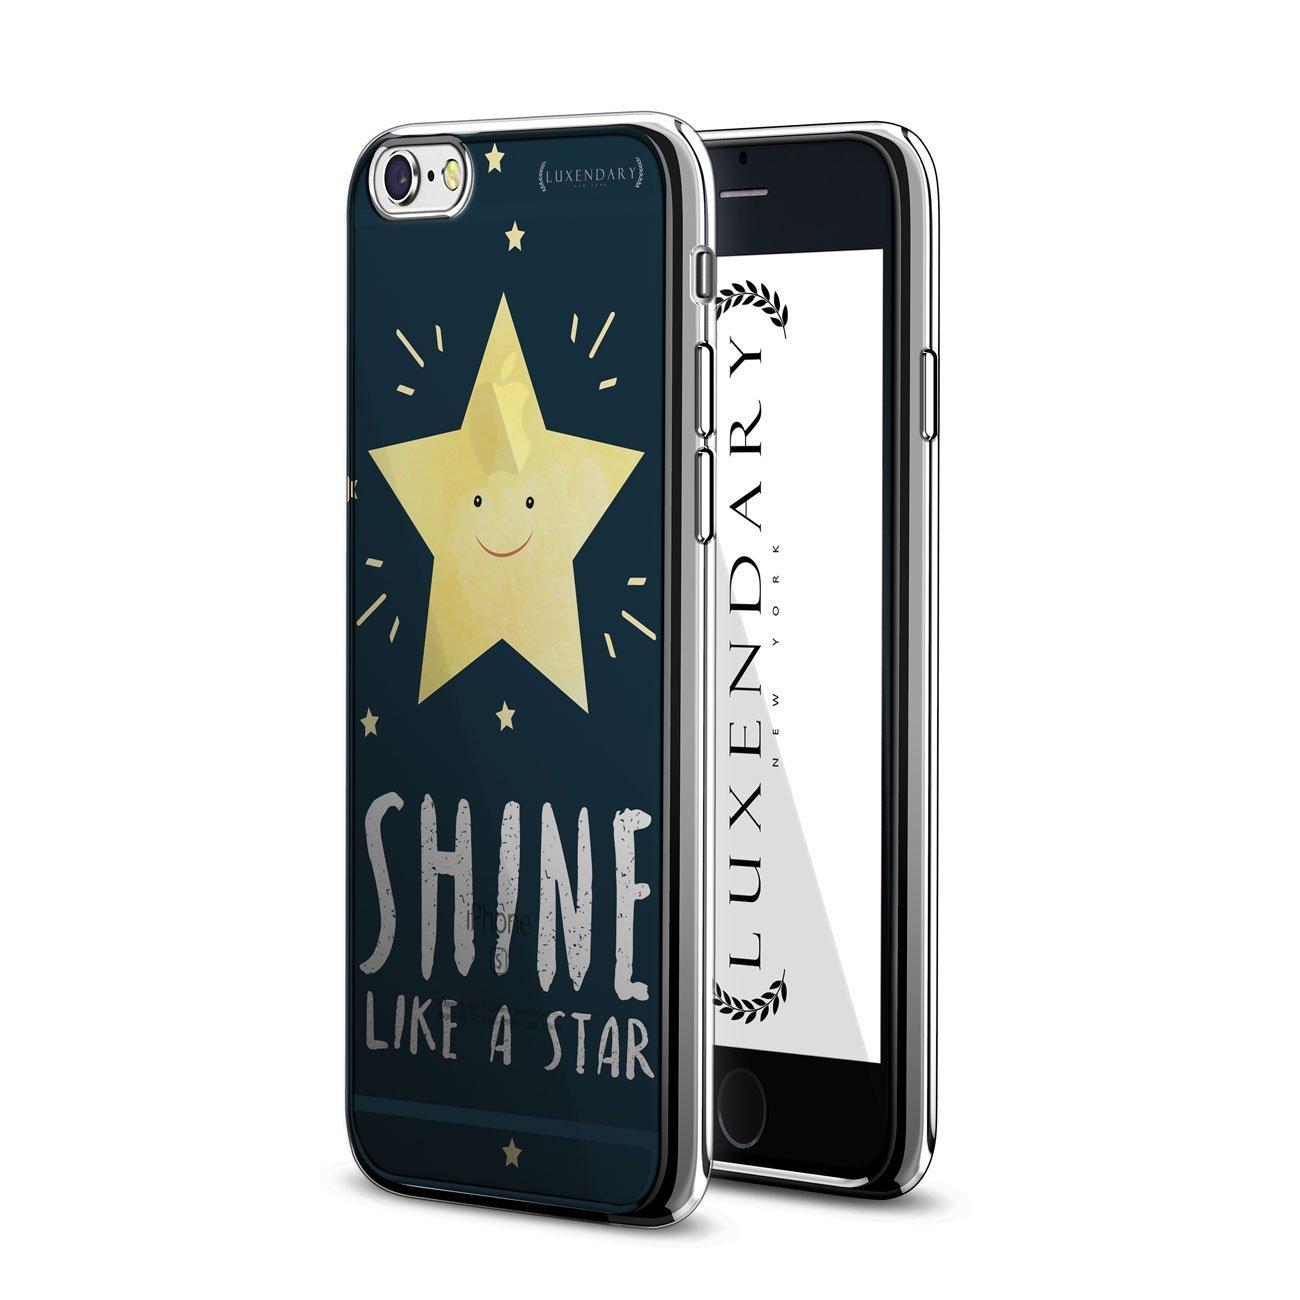 LUXENDARY星のように輝くデザインChromeシリーズCASE iPhone 6 / 6S   B01N0U0M35